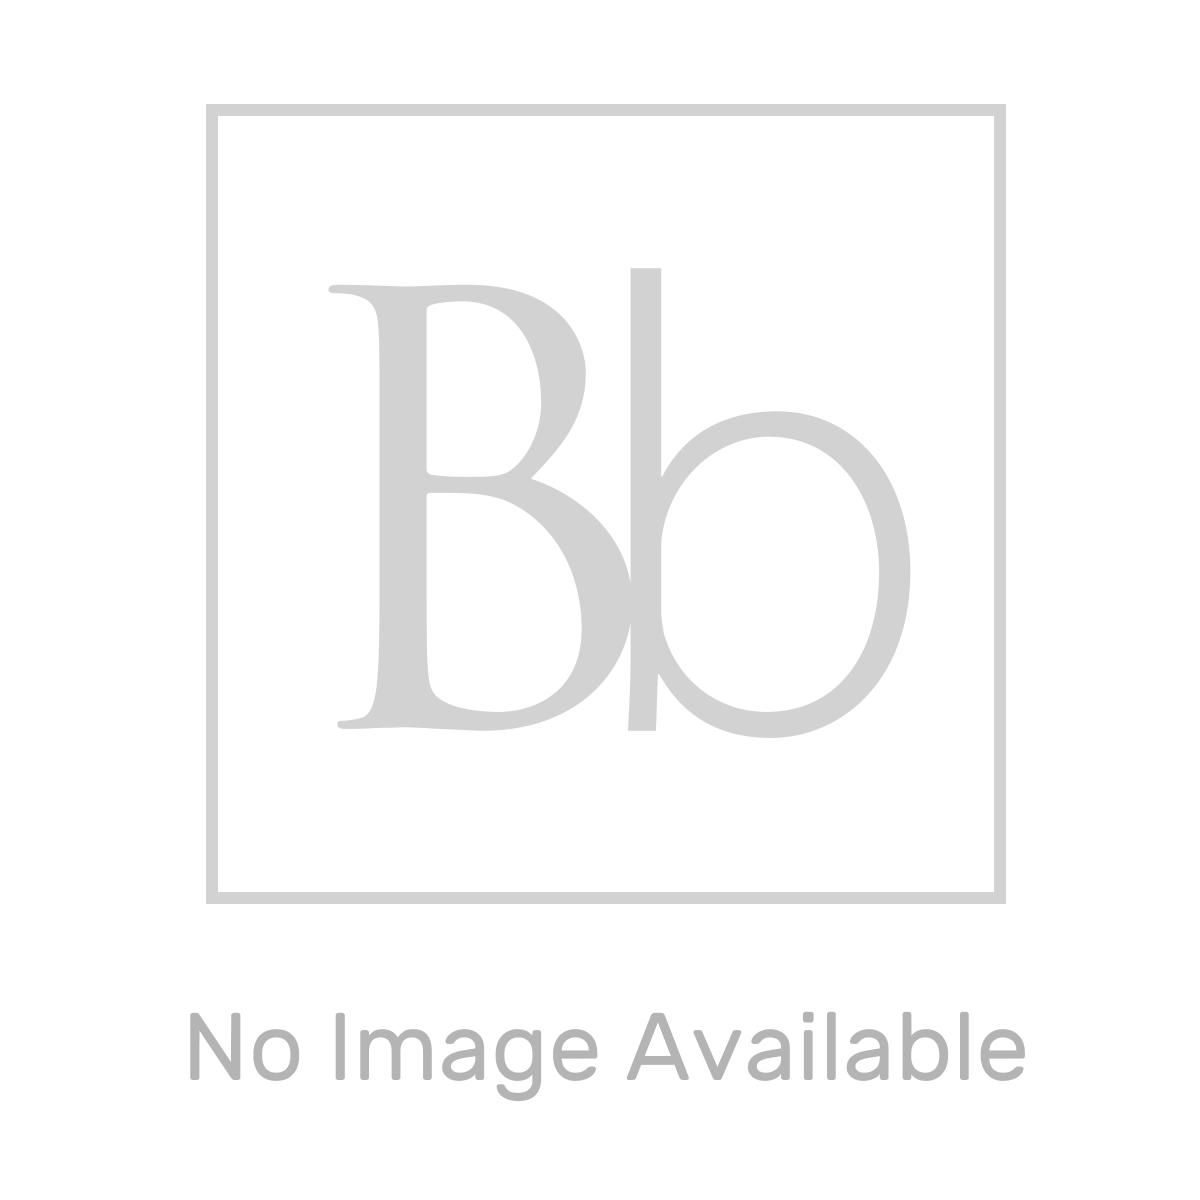 Sensio Nimbus Cool White Round Plinth Light 6 x Kit Inc Driver 3